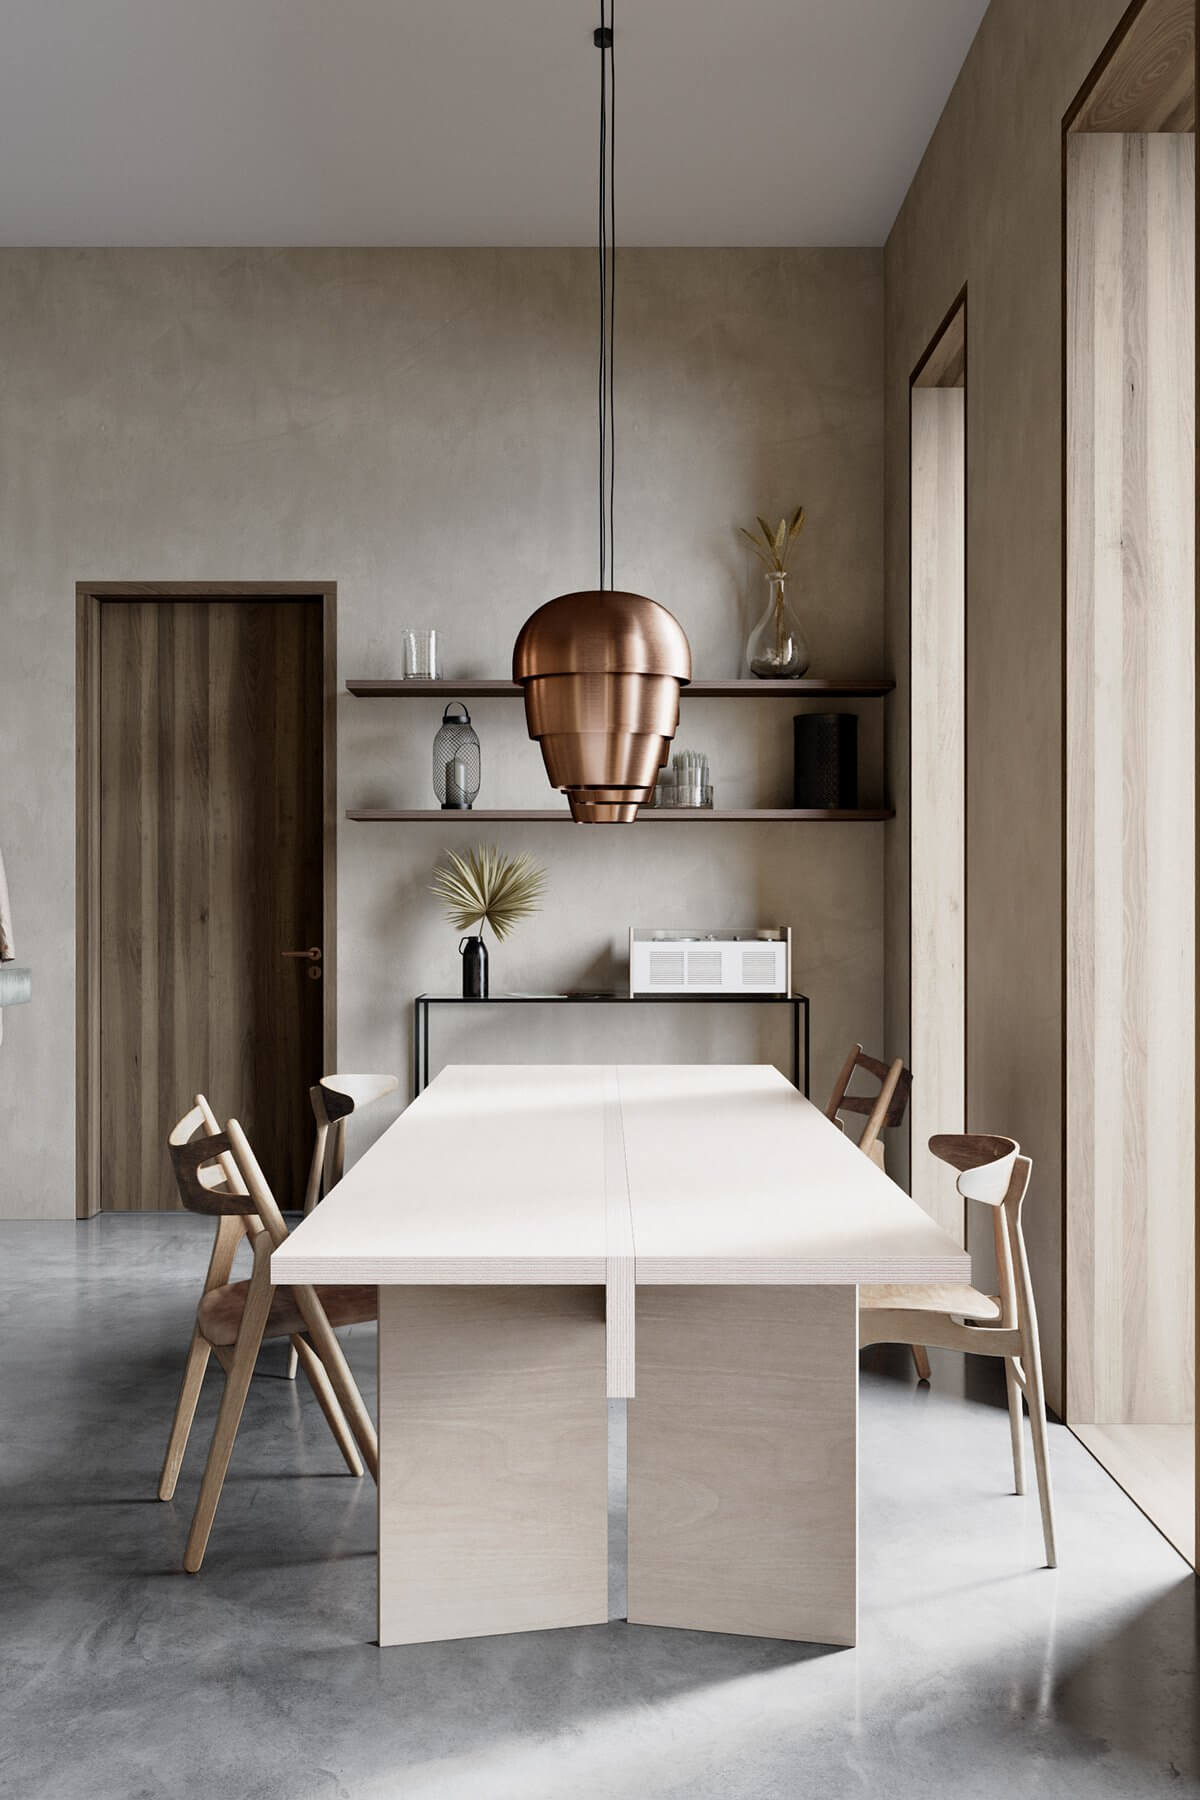 Studio Apartment in Berlin Kreuzberg-dining-room-wood-table